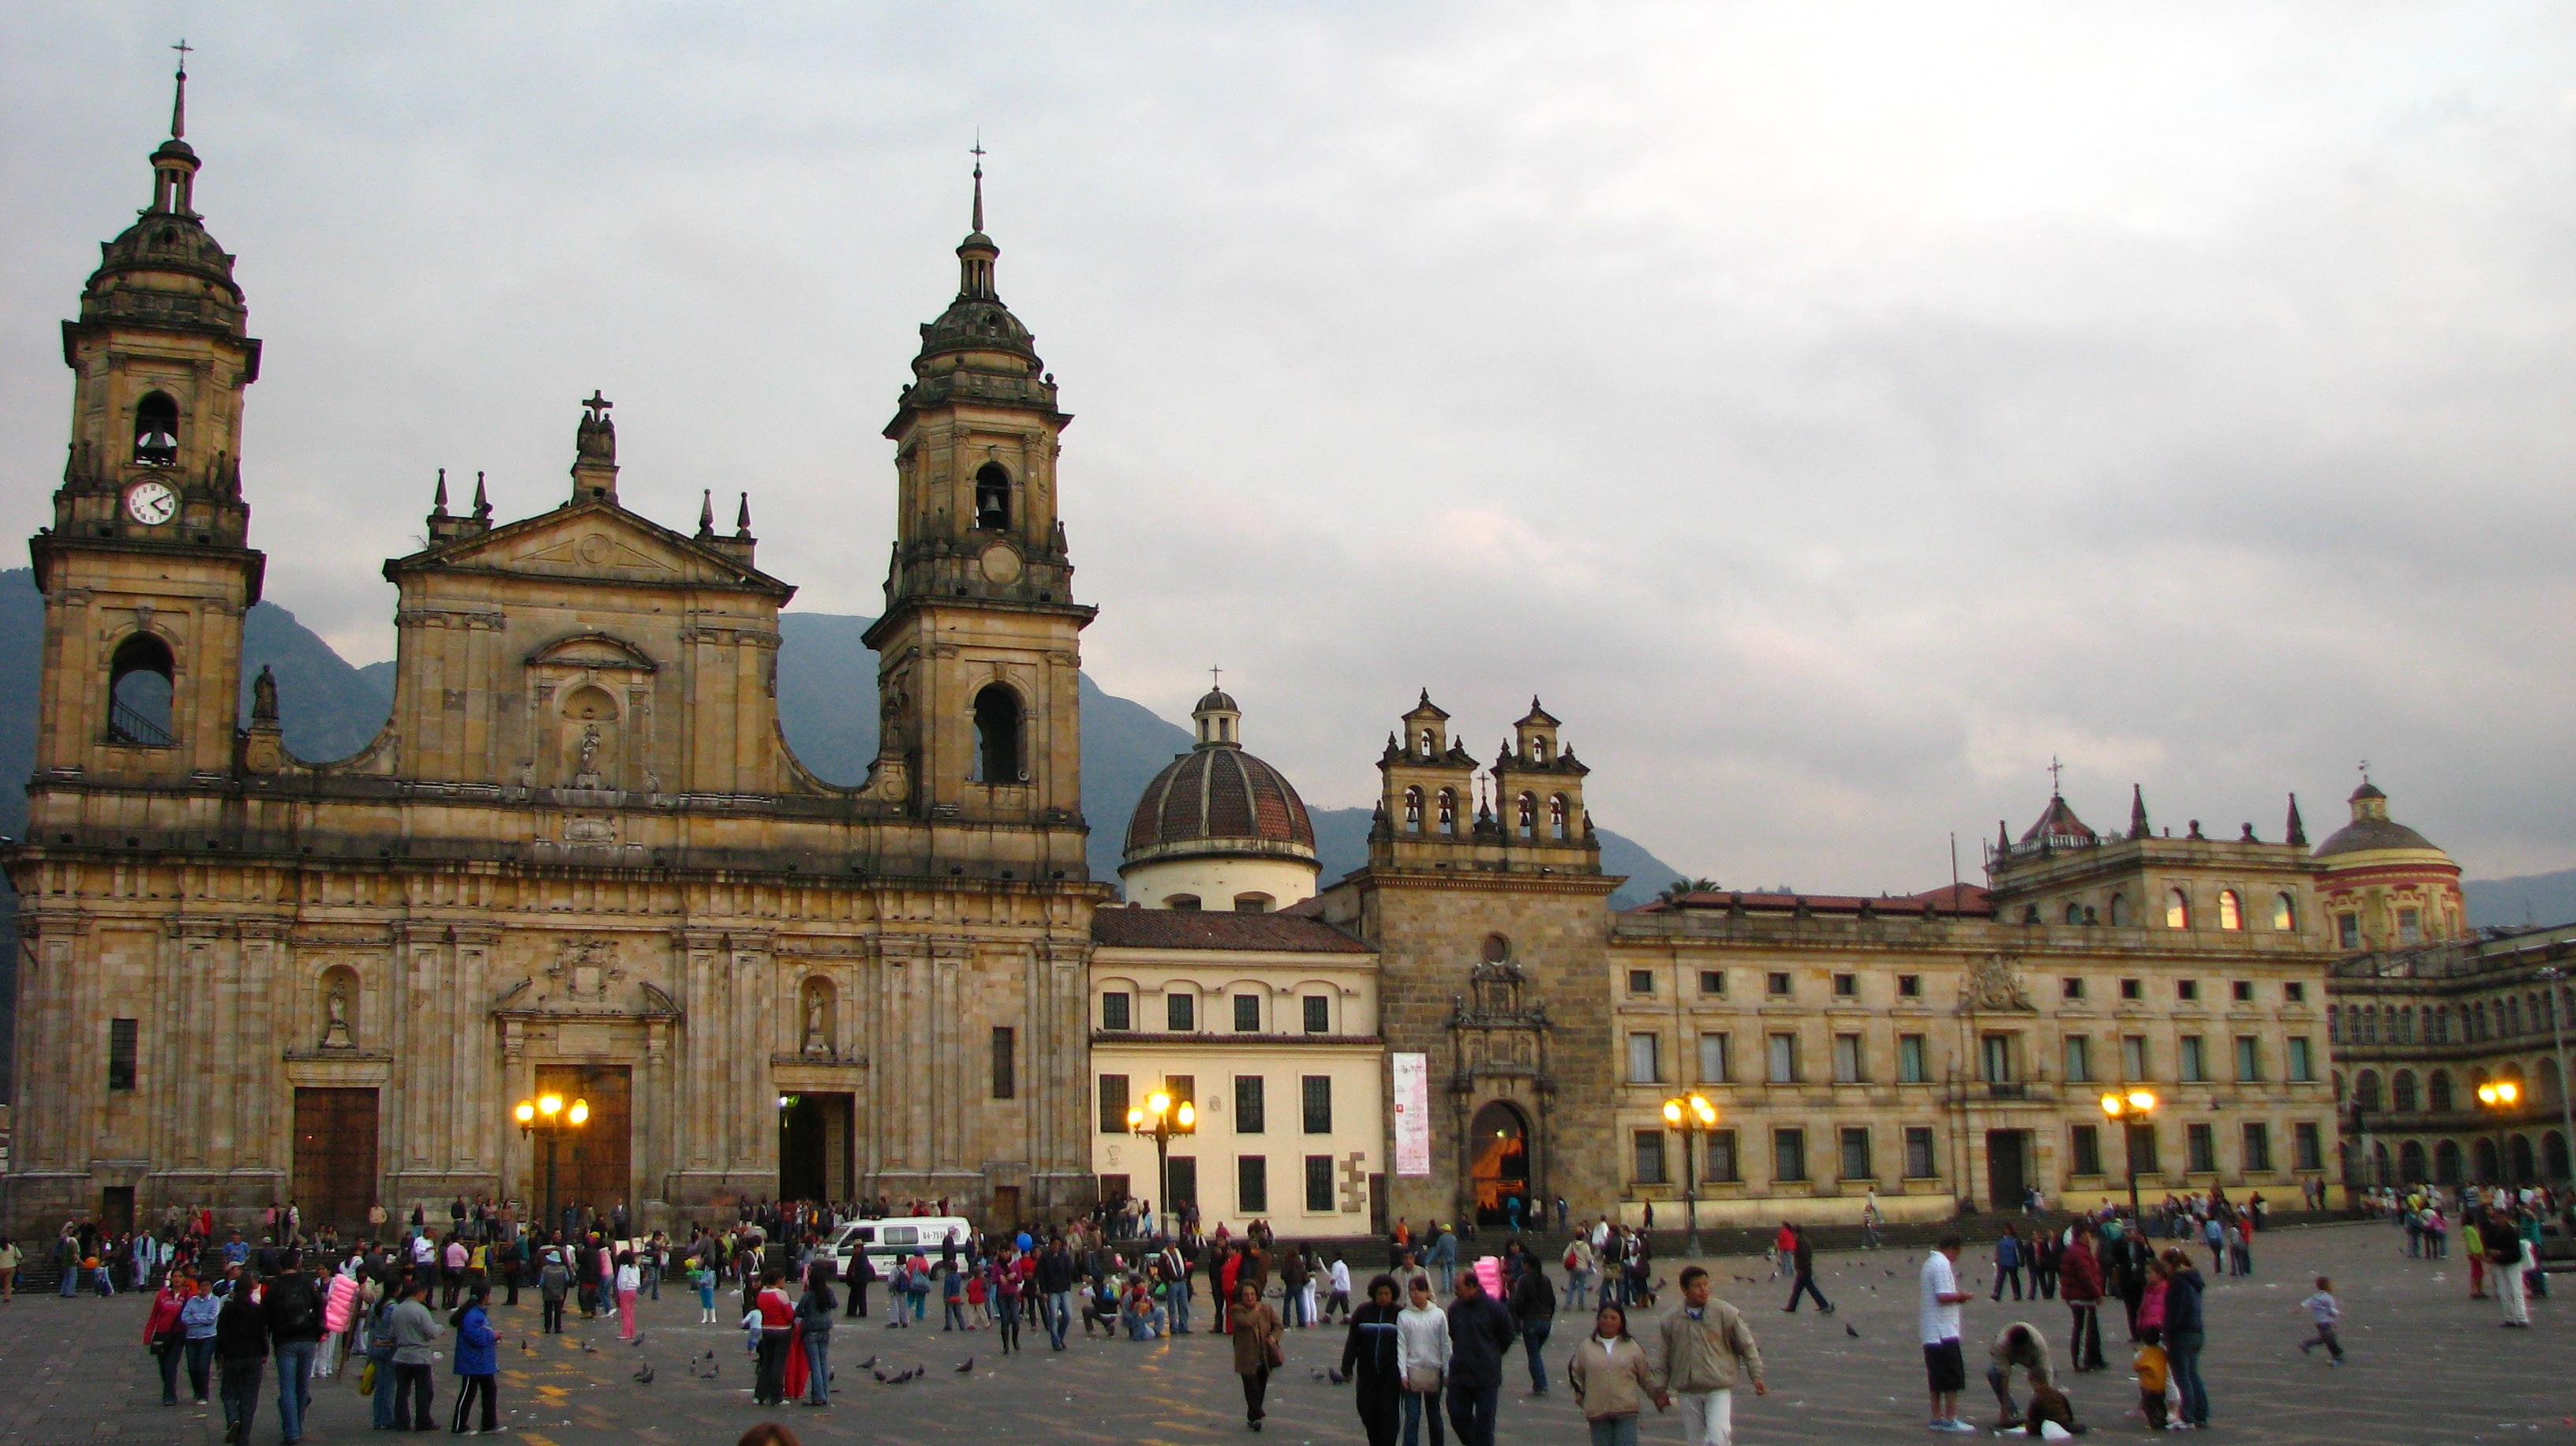 Bogota Colombia  City pictures : Plaza de Bolívar Bogotá, Colombia 1 Wikimedia Commons